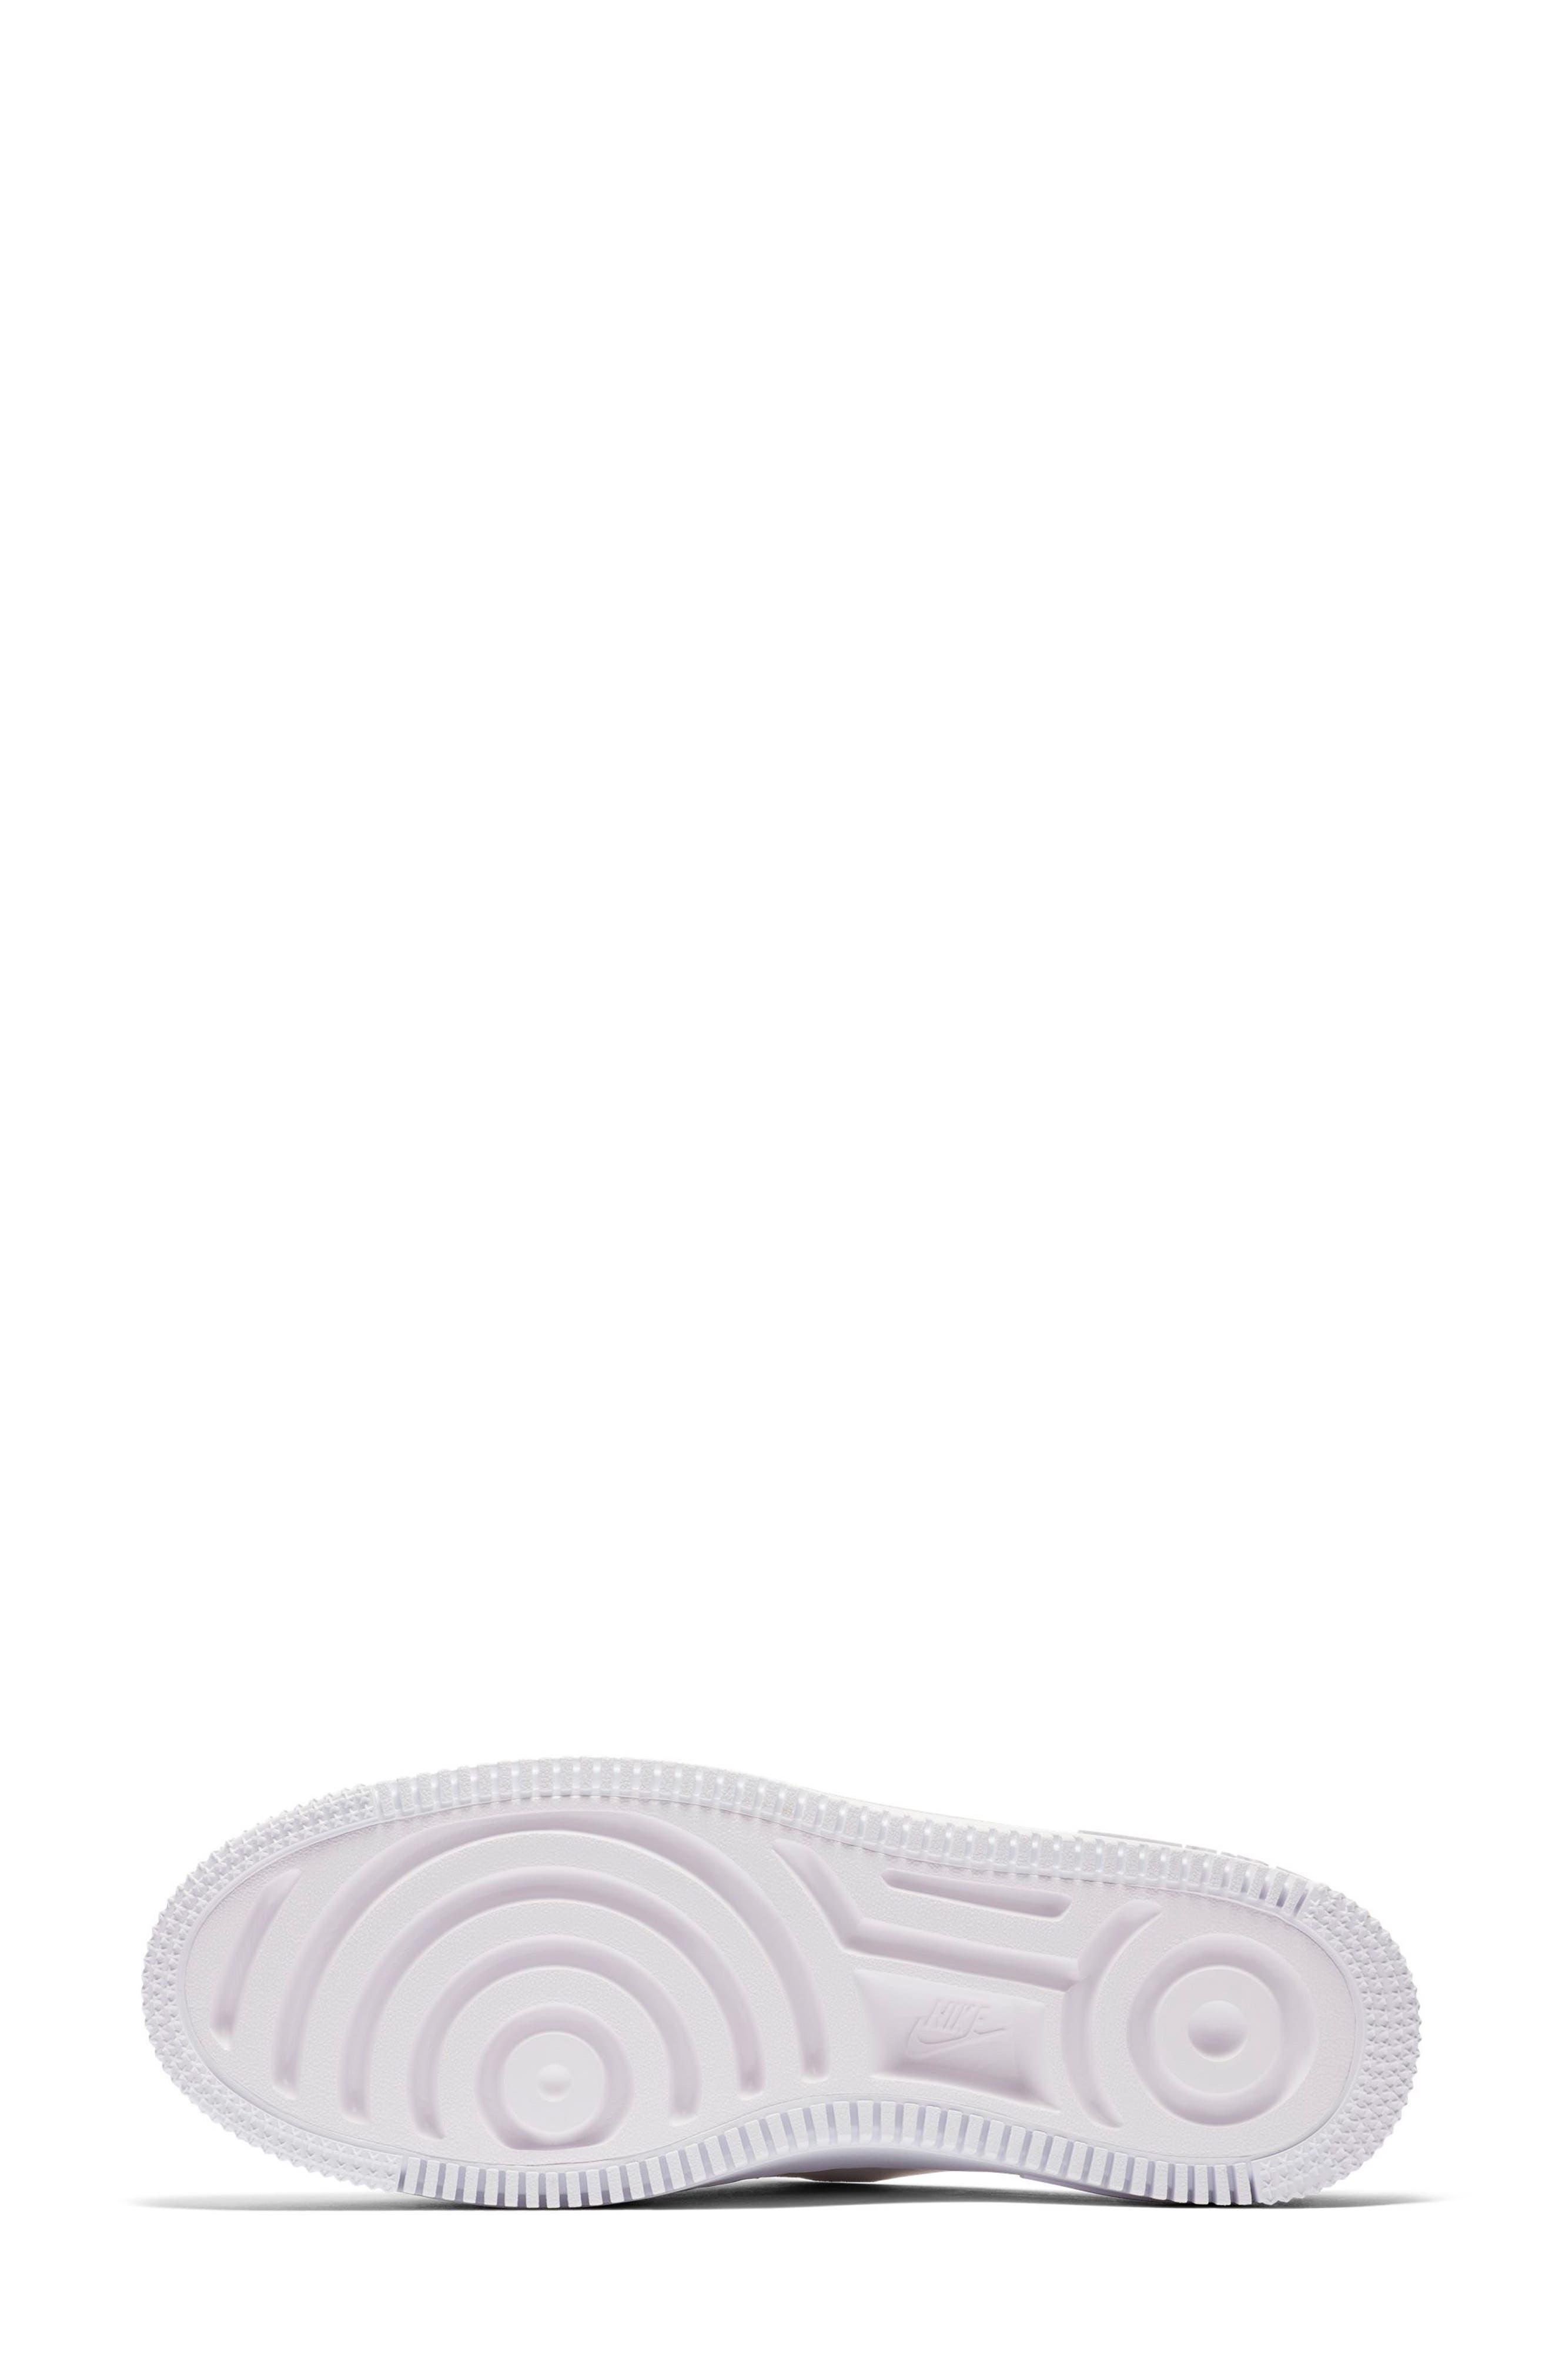 Air Force 1 Lover XX Slip-On Mule Sneaker,                             Alternate thumbnail 9, color,